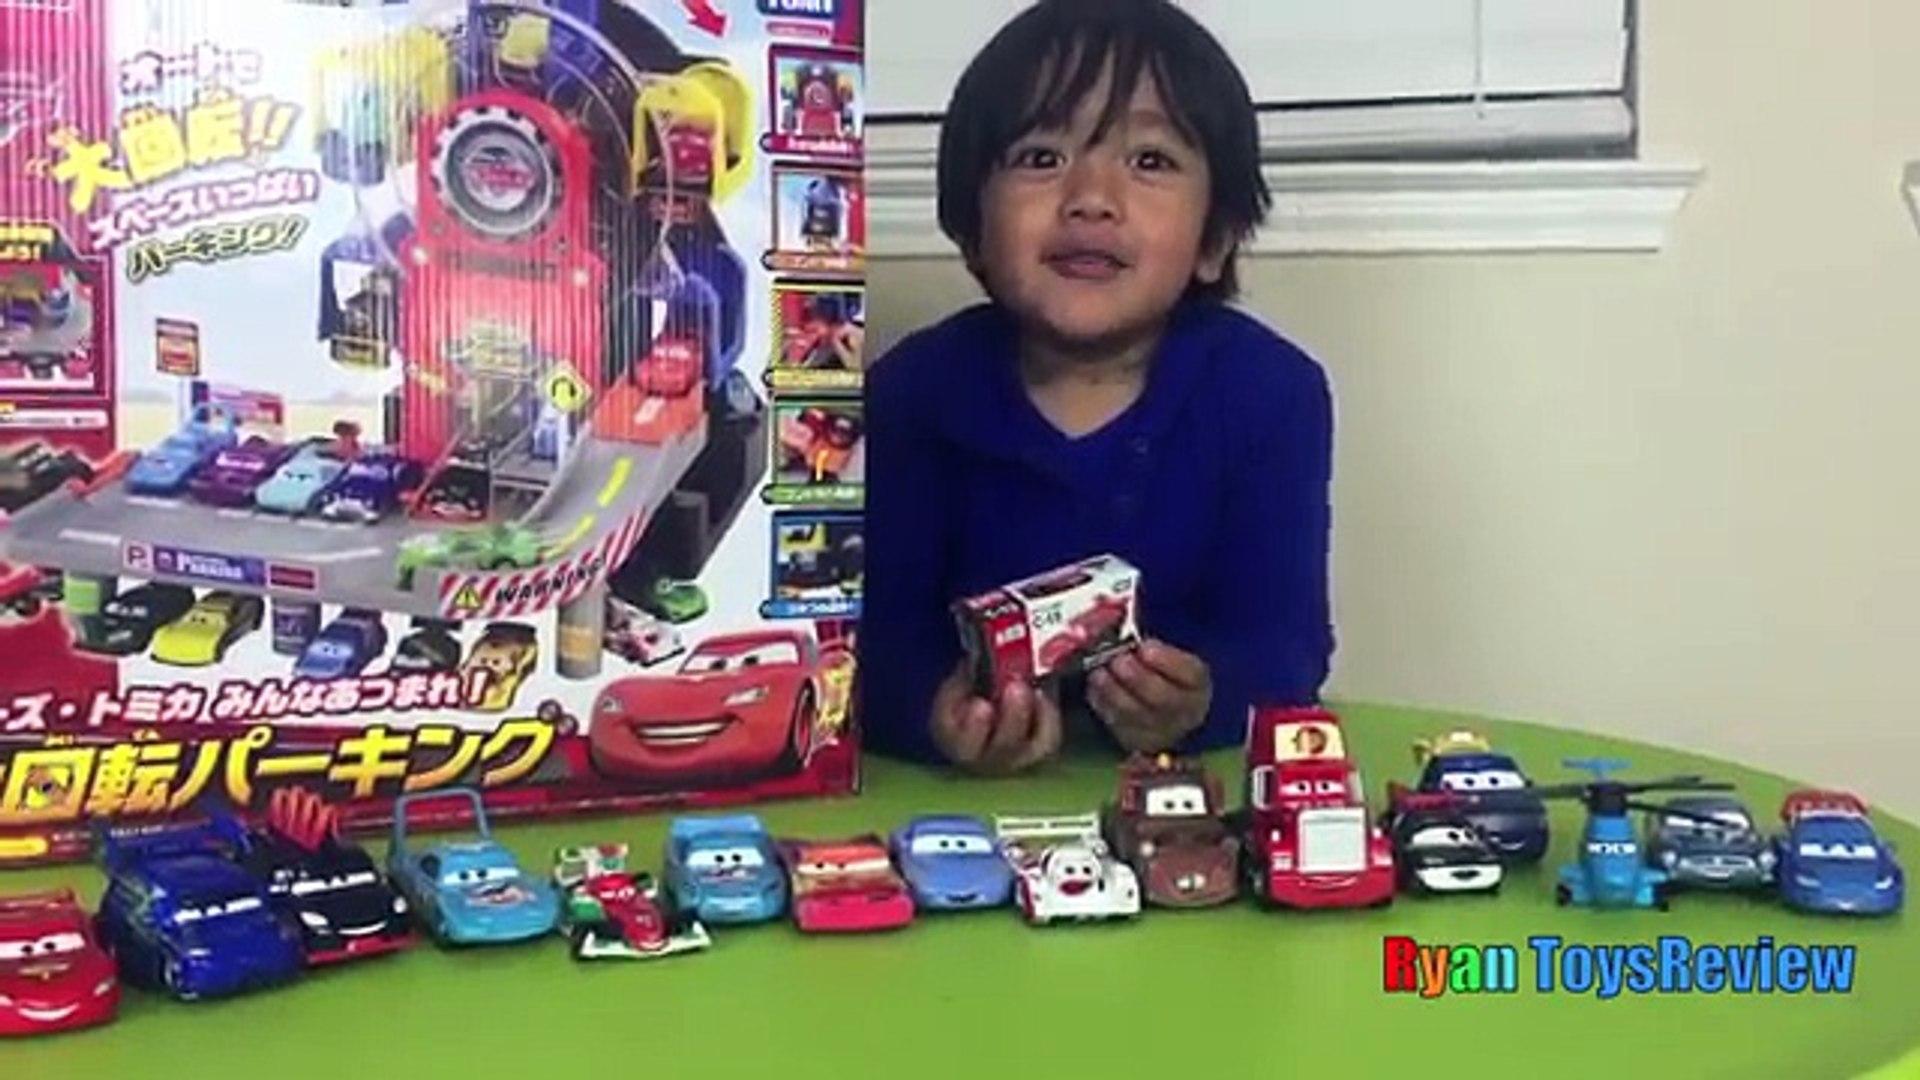 Disney Pixar Cars Toys Ferris Wheels Tomy Big Parking Lightning McQueen Kinder E